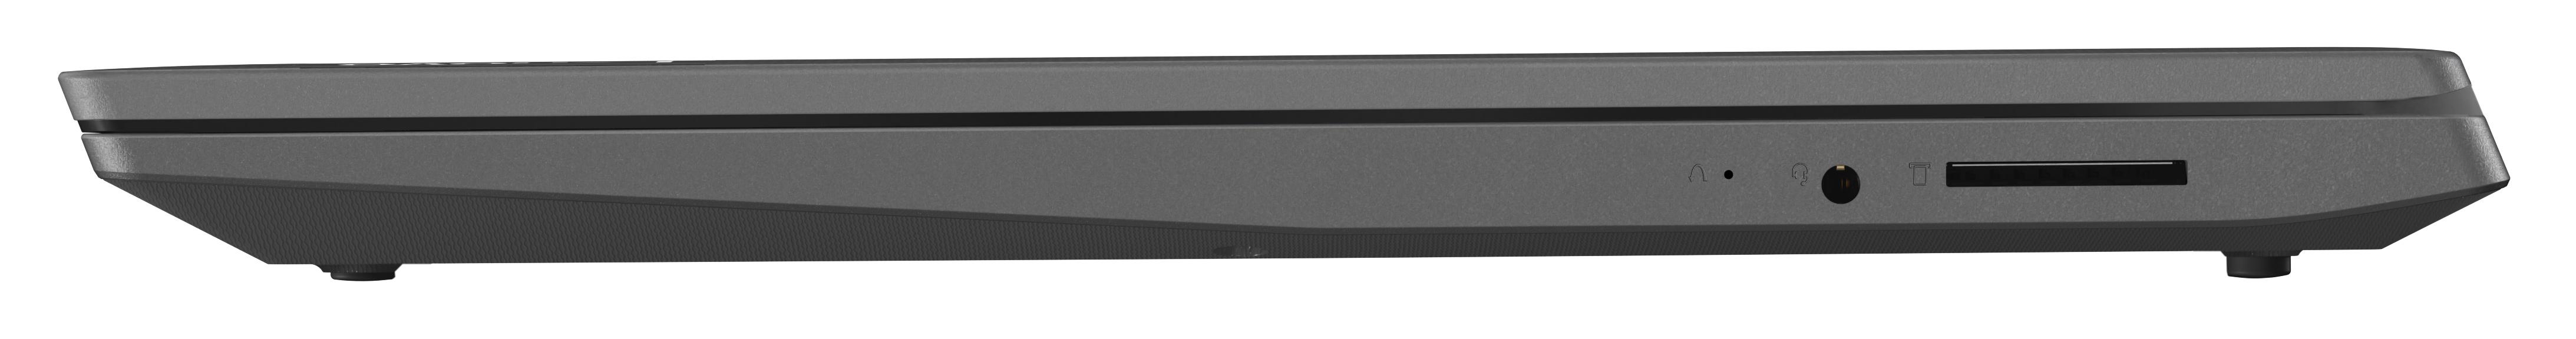 Фото  Ноутбук Lenovo V15 IGL Iron Grey (82C30023RU)